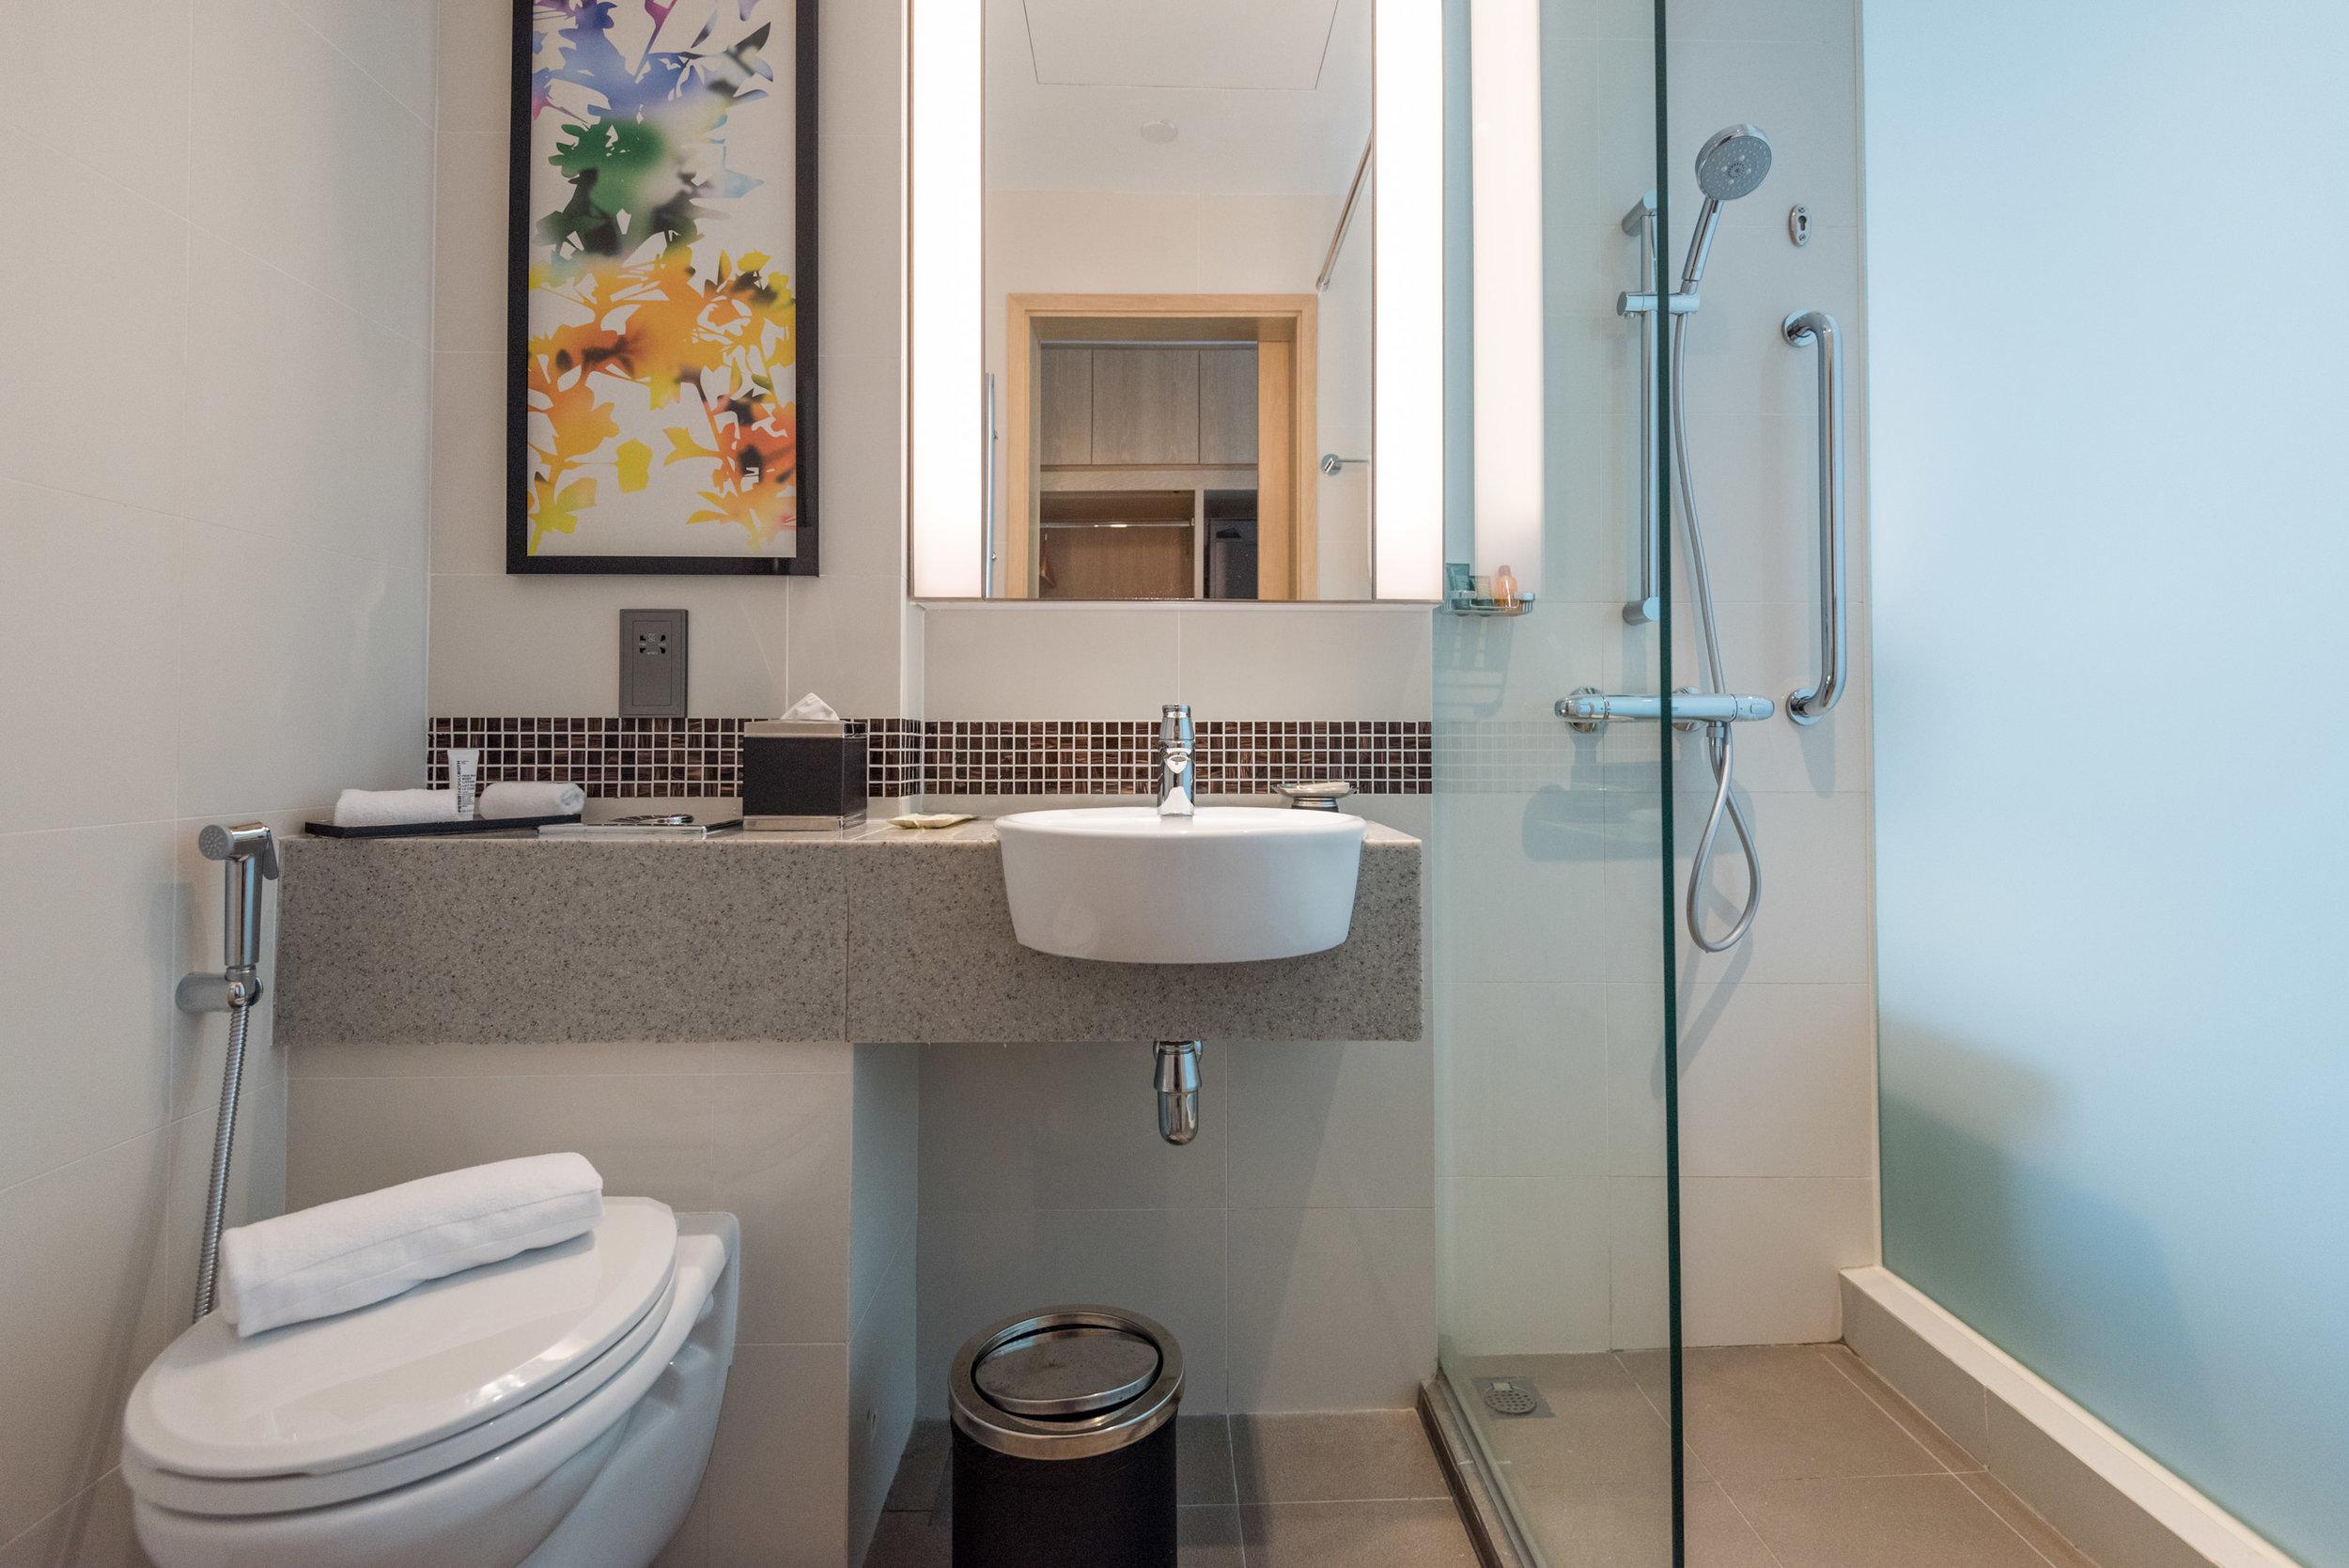 Bathroom  King Deluxe Room with Balcony - Hilton Garden Inn Singapore Serangoon